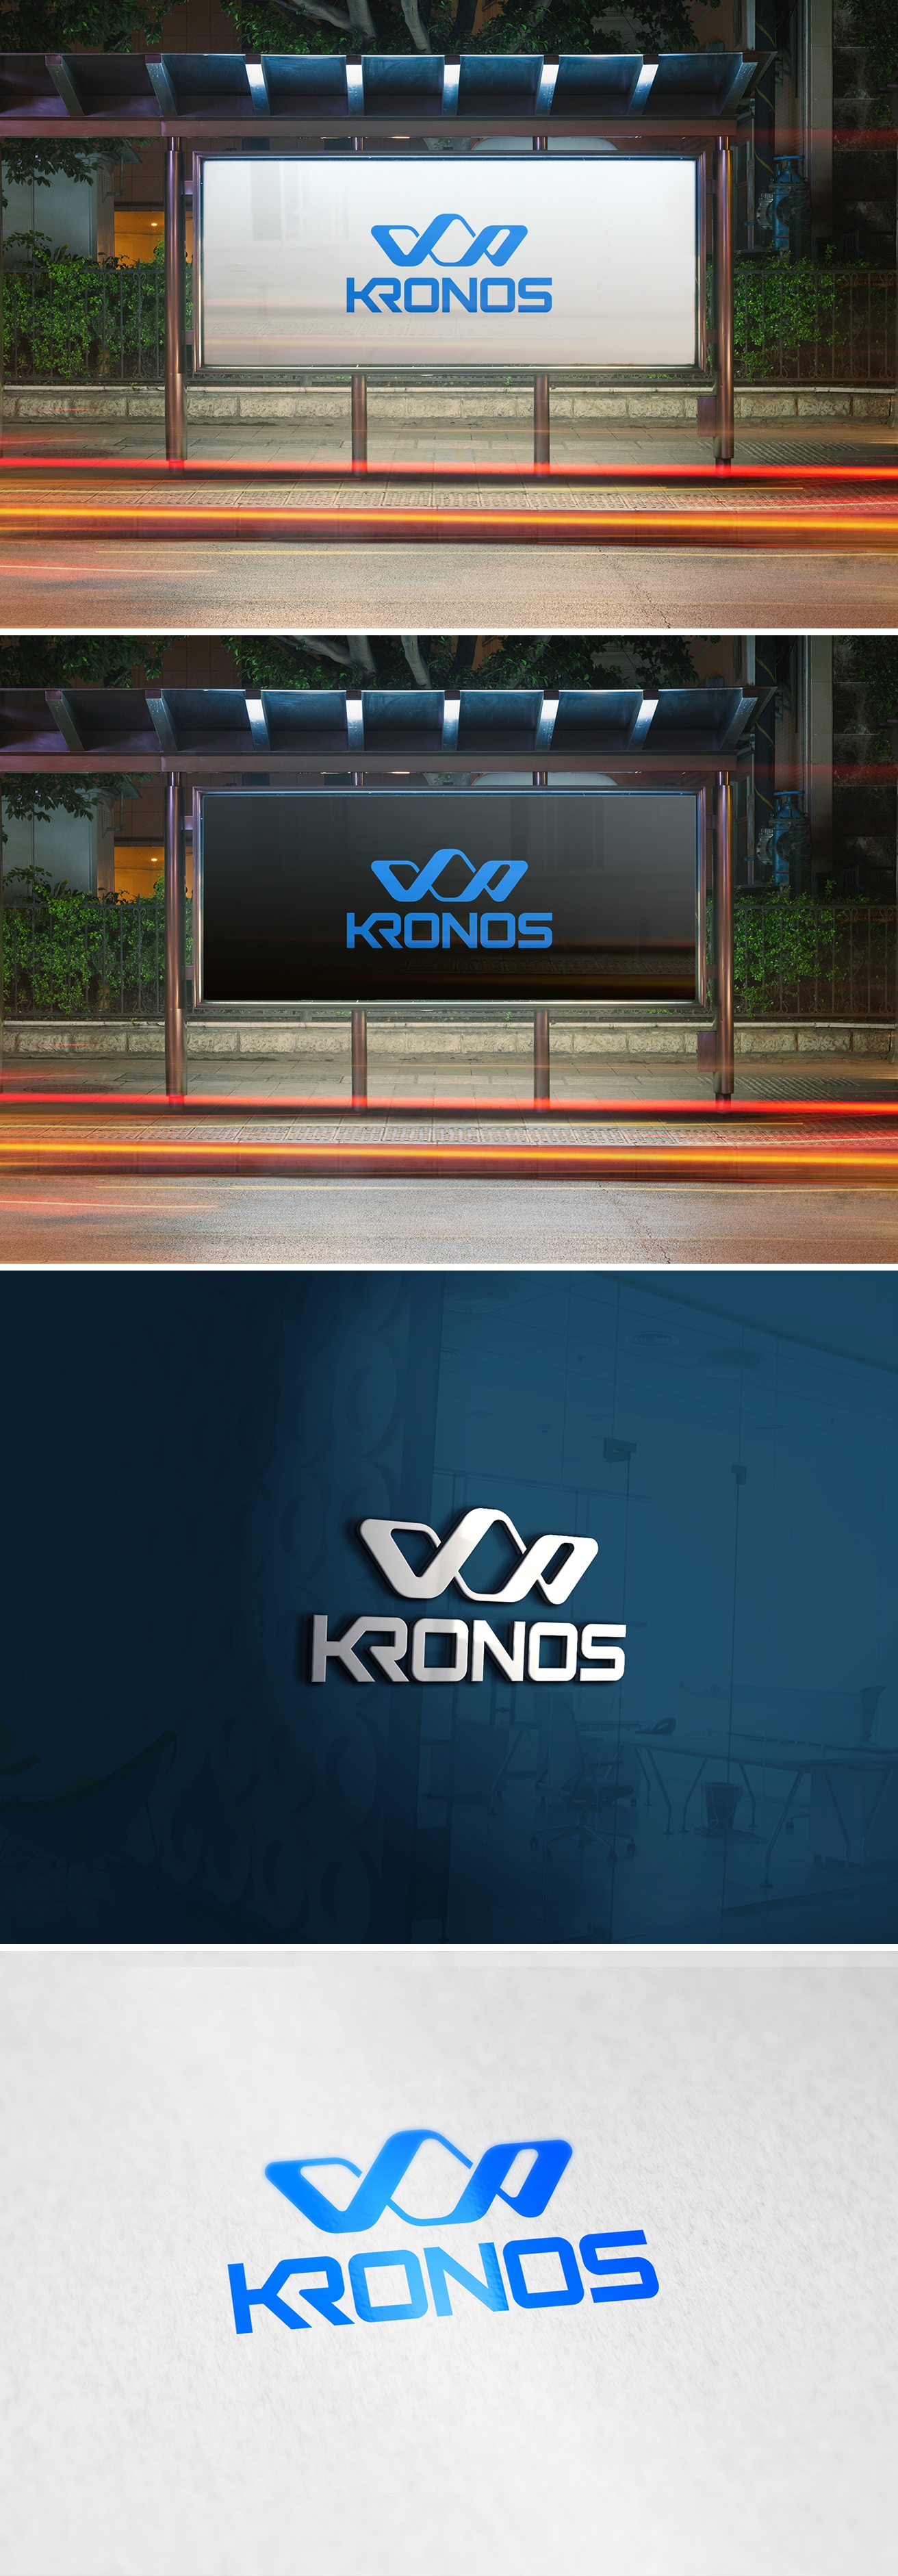 Разработать логотип KRONOS фото f_6475faf9fb33f4ef.jpg